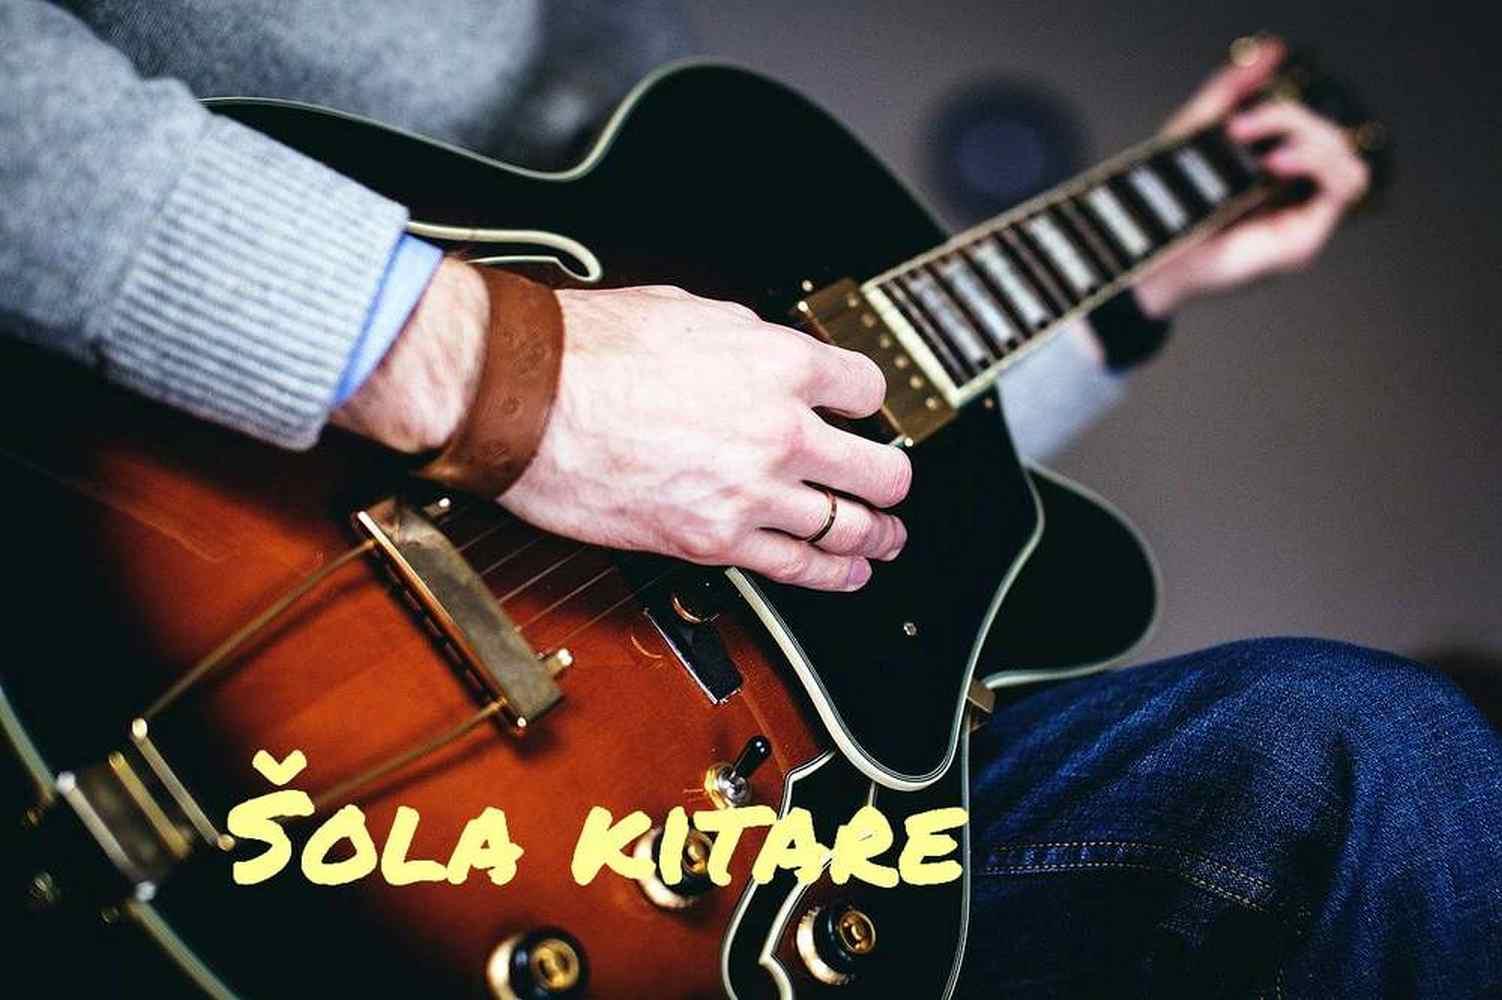 Lekcije učenje igranje kitare glasbena šola na daljavo